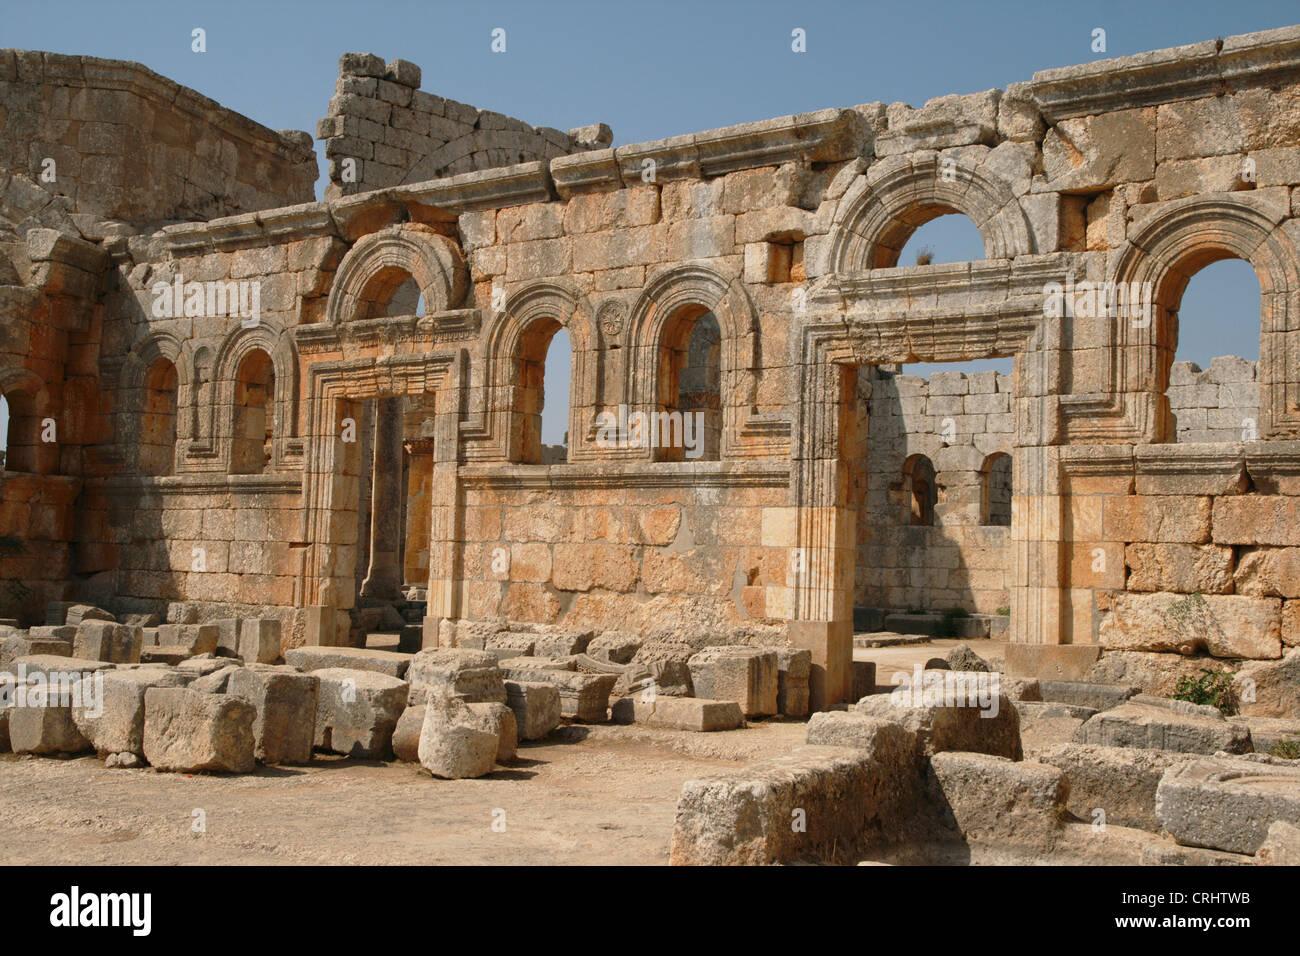 St. Simeon basilica, Syria, Qala'at Samaan - Stock Image